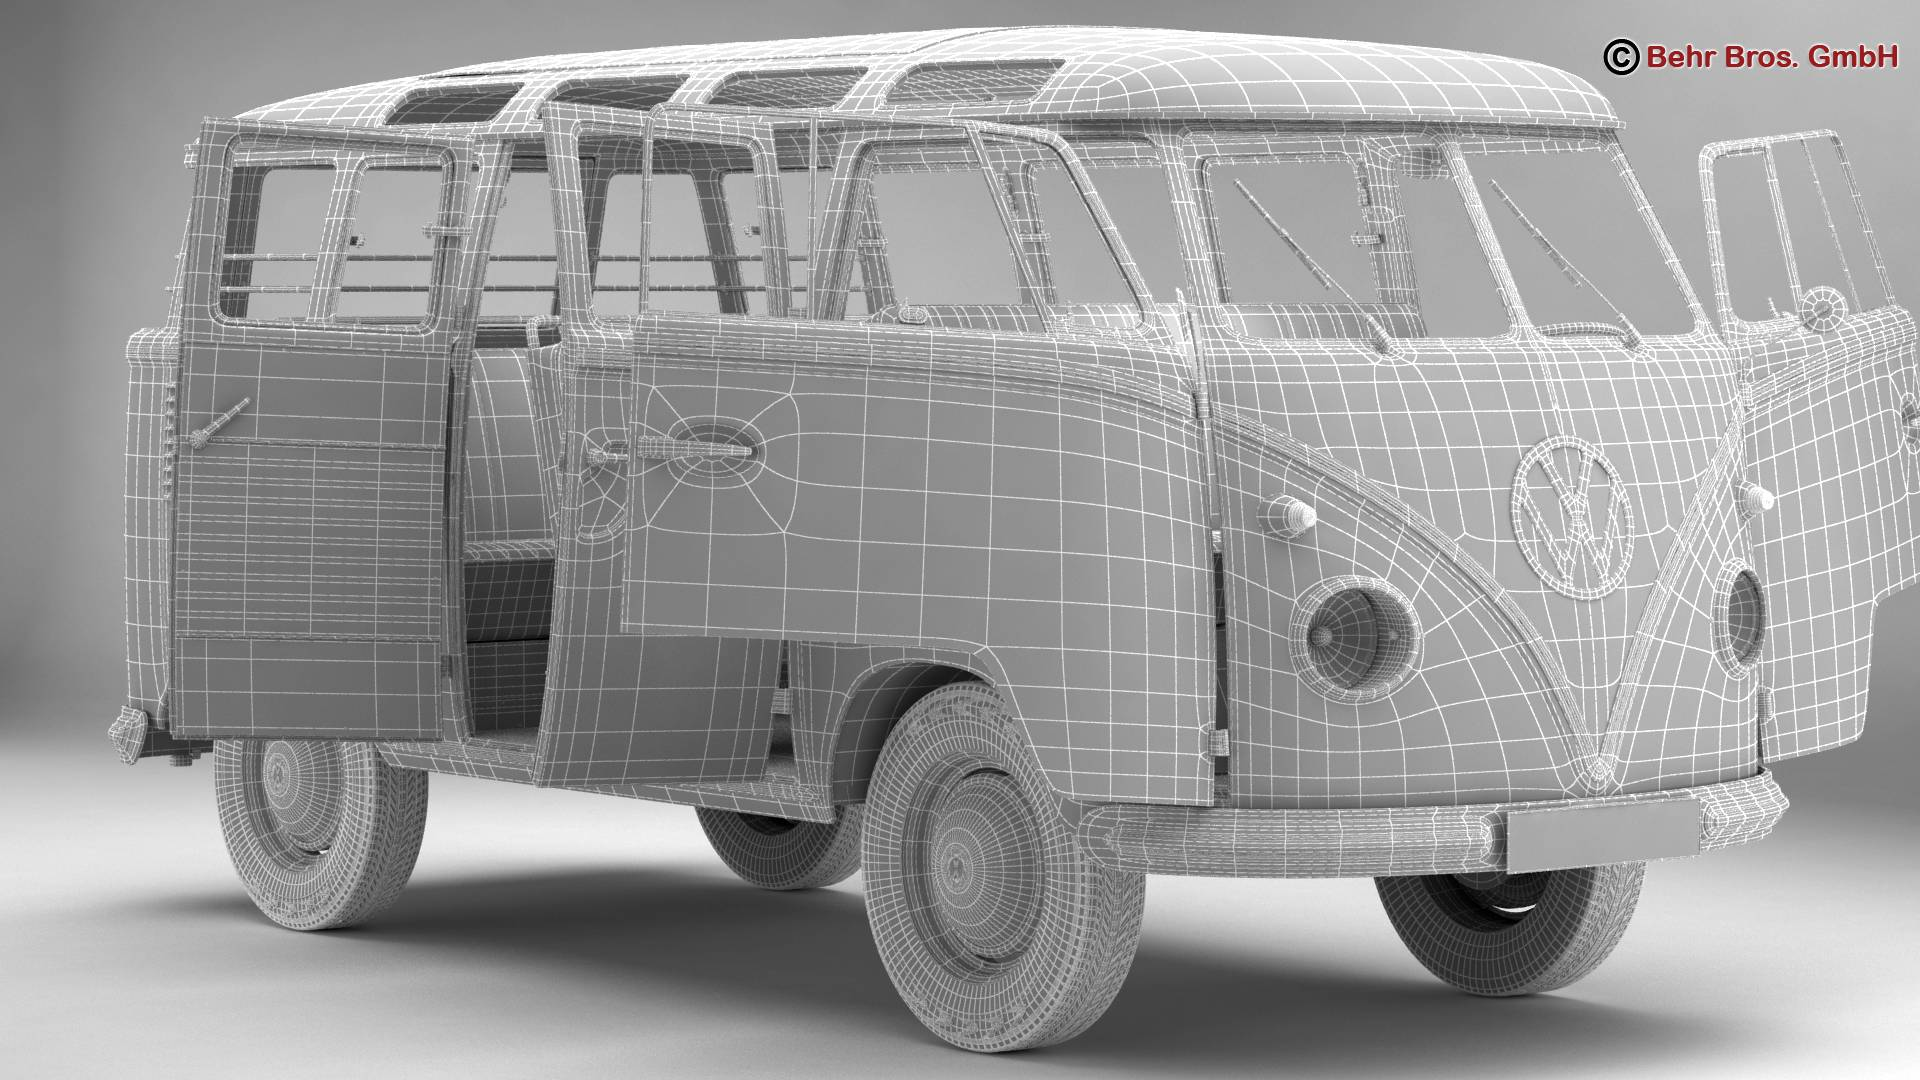 volkswagen type 2 samba 1959 3d model 3ds max fbx c4d lwo ma mb obj 217123